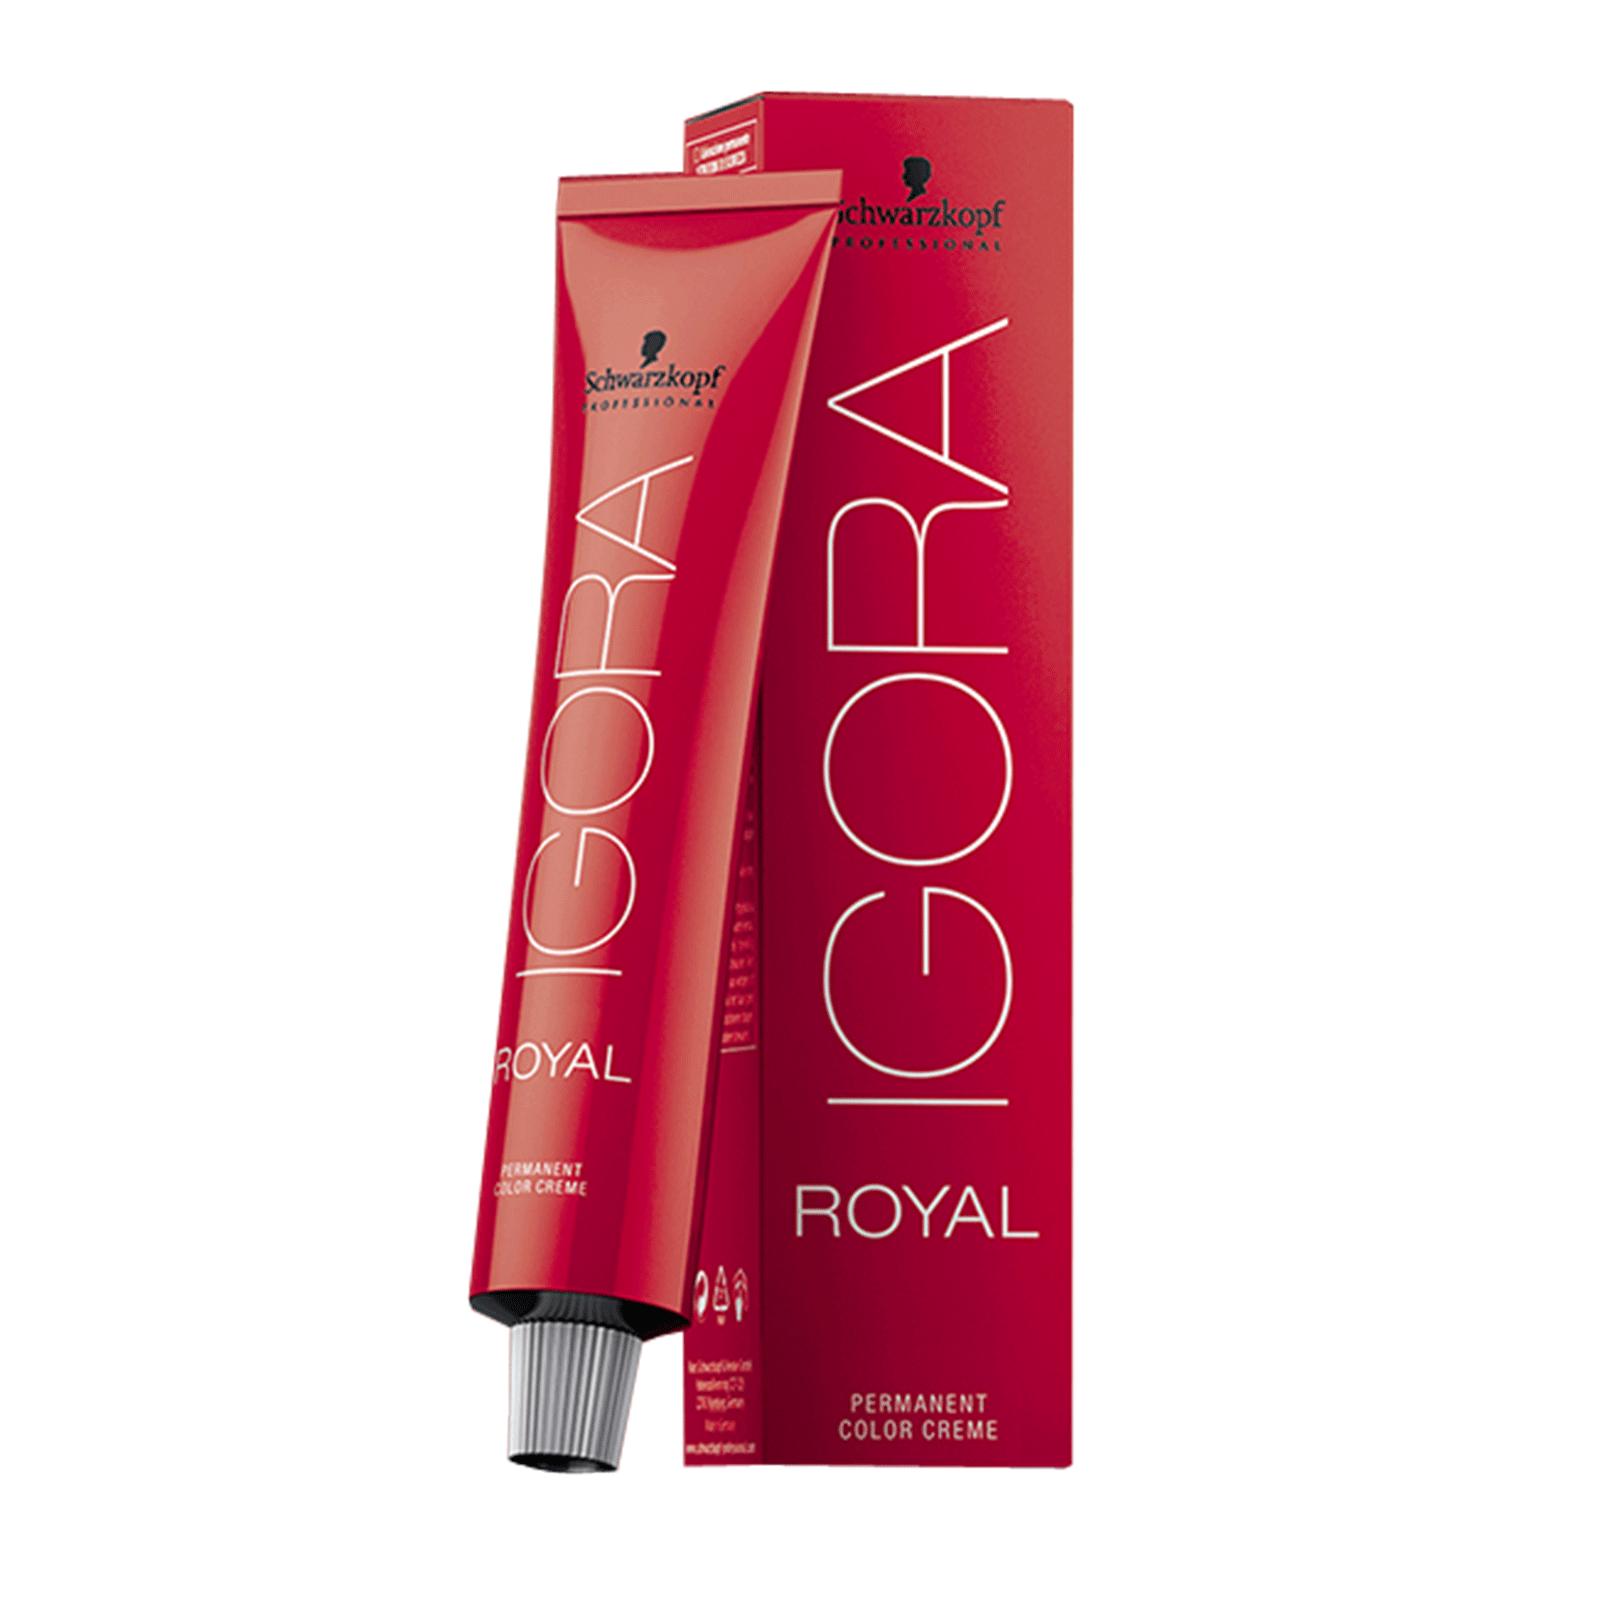 88d1eff5ee 9.5-18 Rose - Royal Permanent Color Creme - Schwarzkopf Professional ...